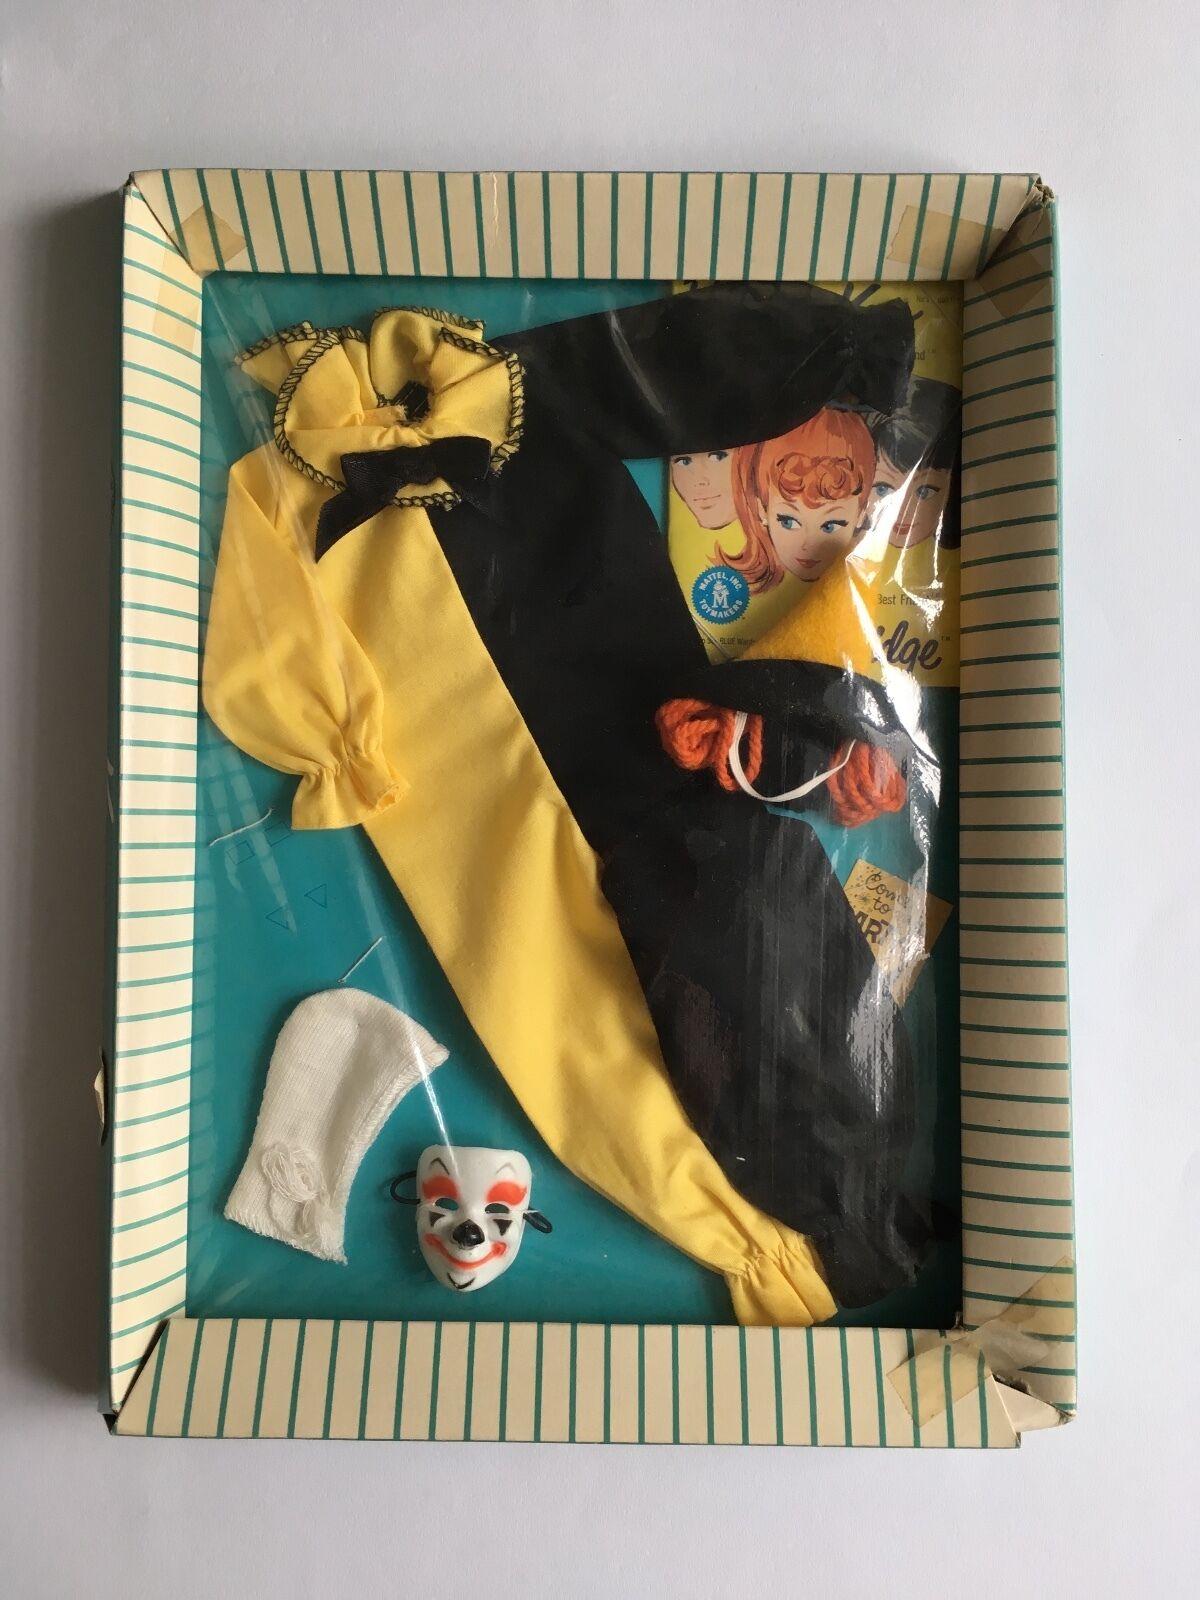 VINTAGE BARBIE DOLL 1963 Ken Doll Masquerade Masquerade Masquerade  794 NRFB OUTFIT 8664ac